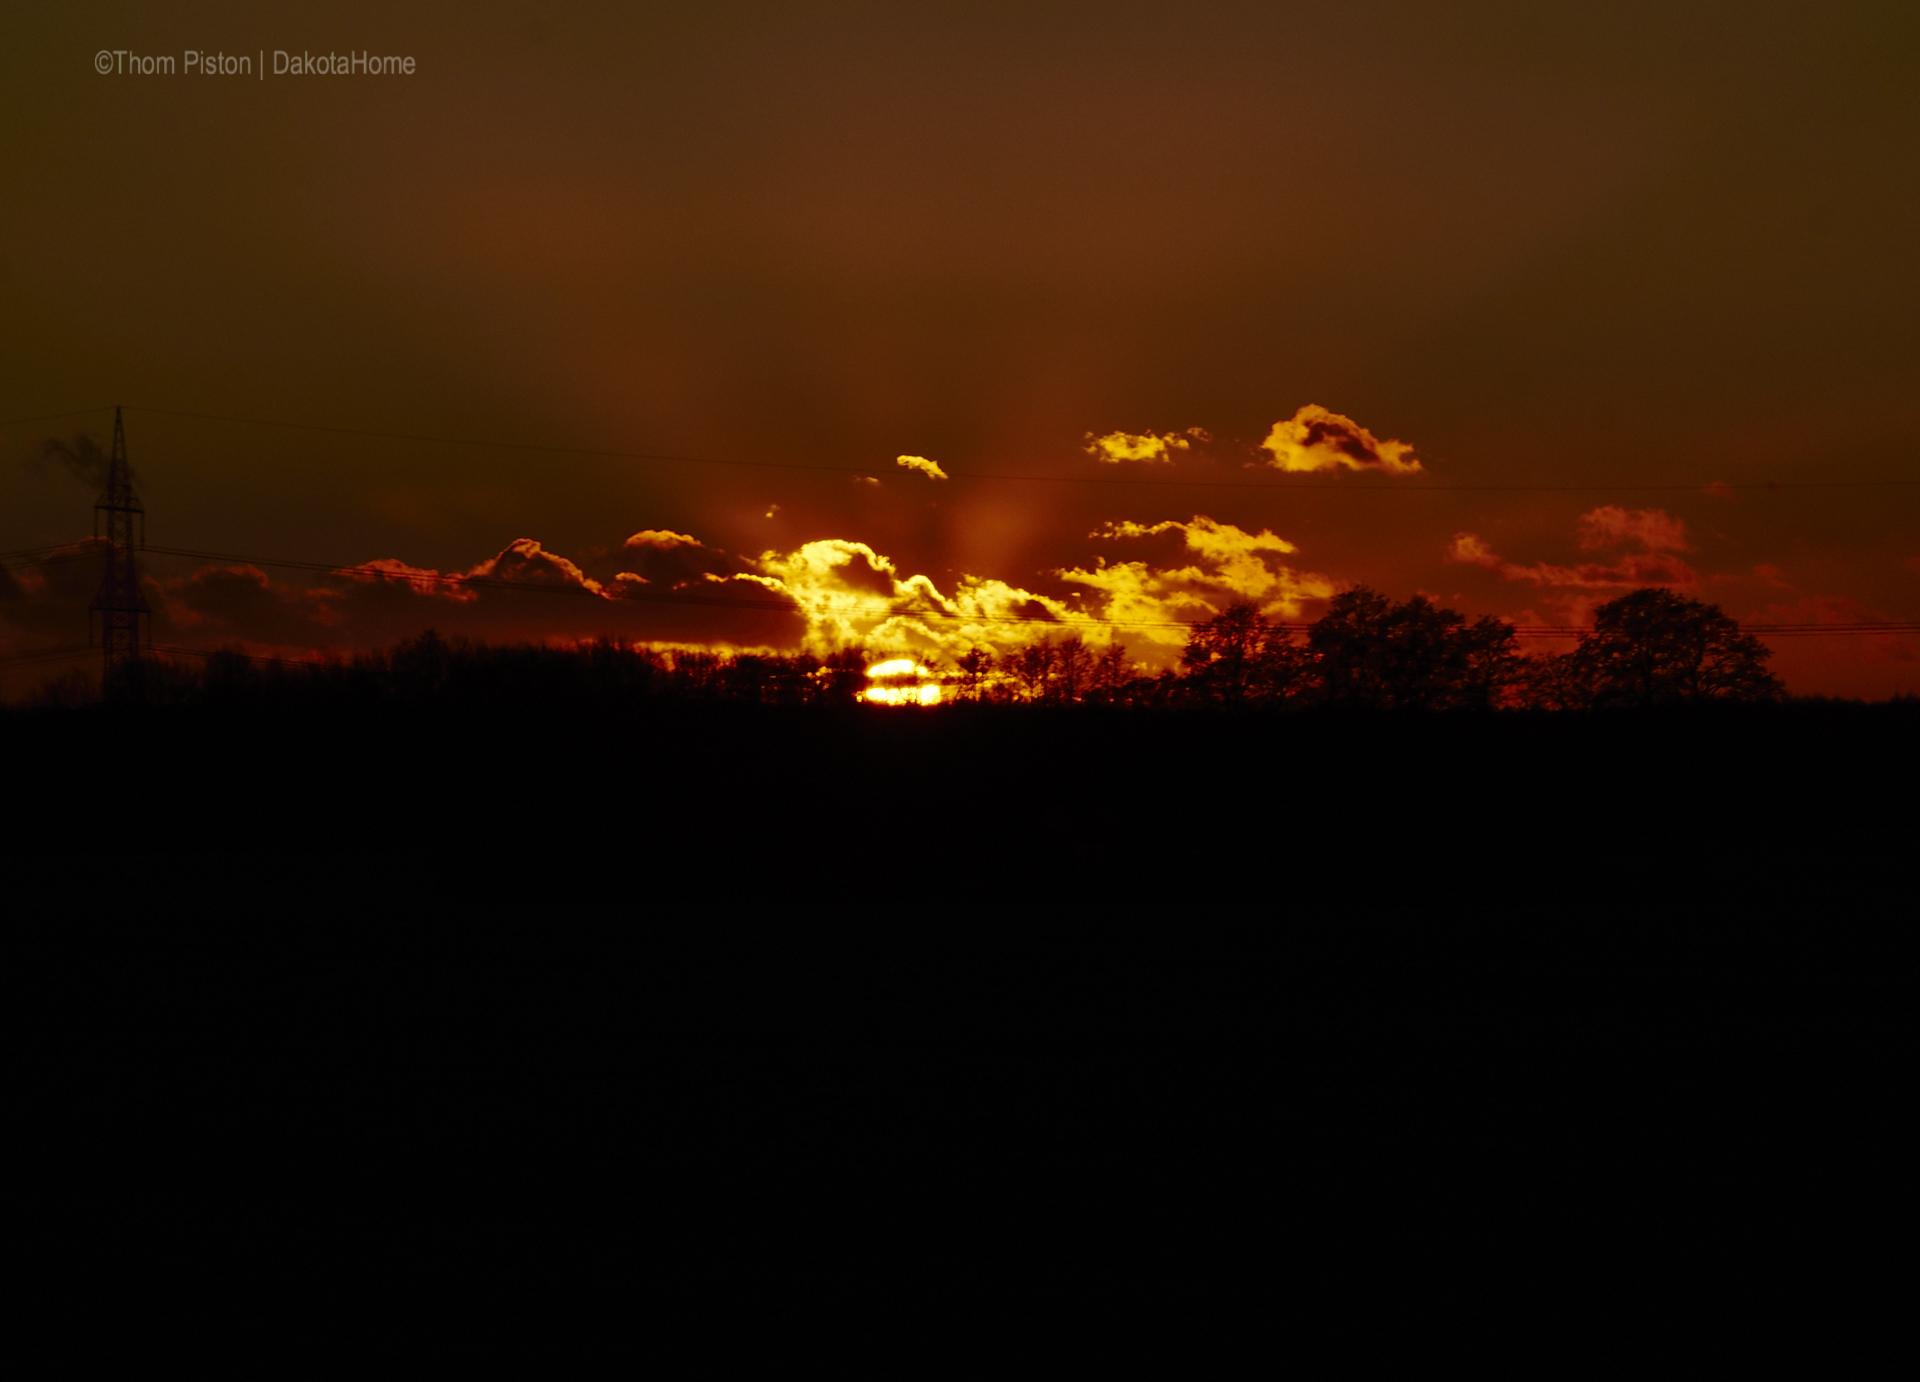 Sonnenuntergänge im Januar 2019 at Dakota Home Mitte Januar 2019